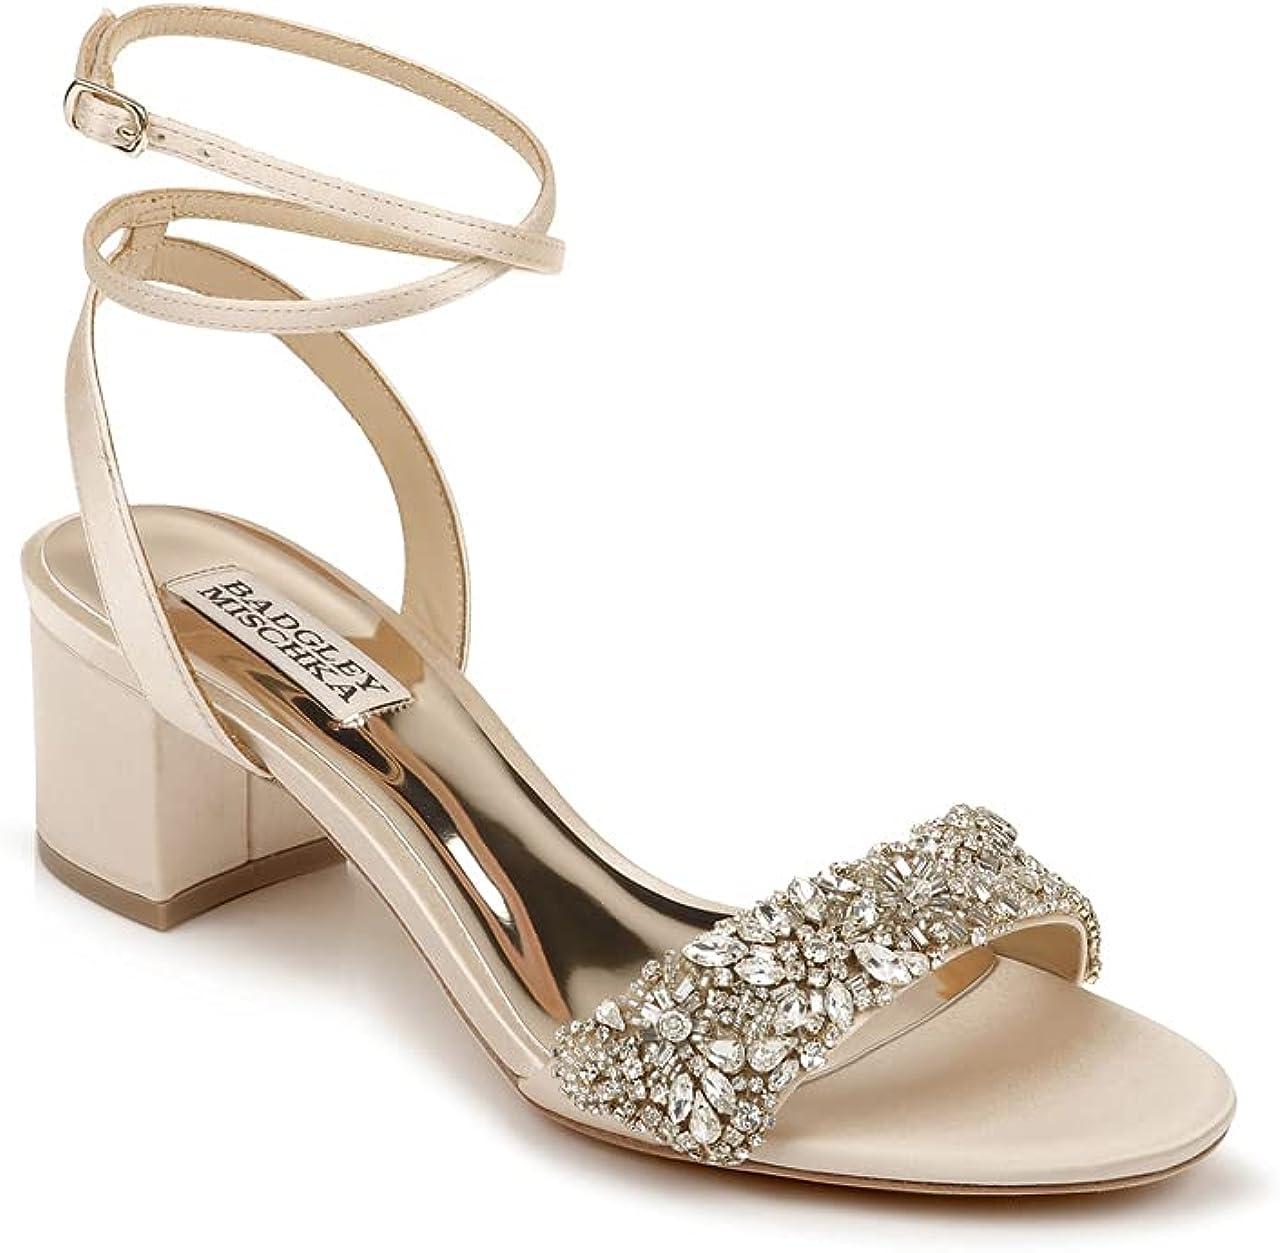 Badgley Mischka Women's Ankle Strap, Block Heel Sandal Heeled